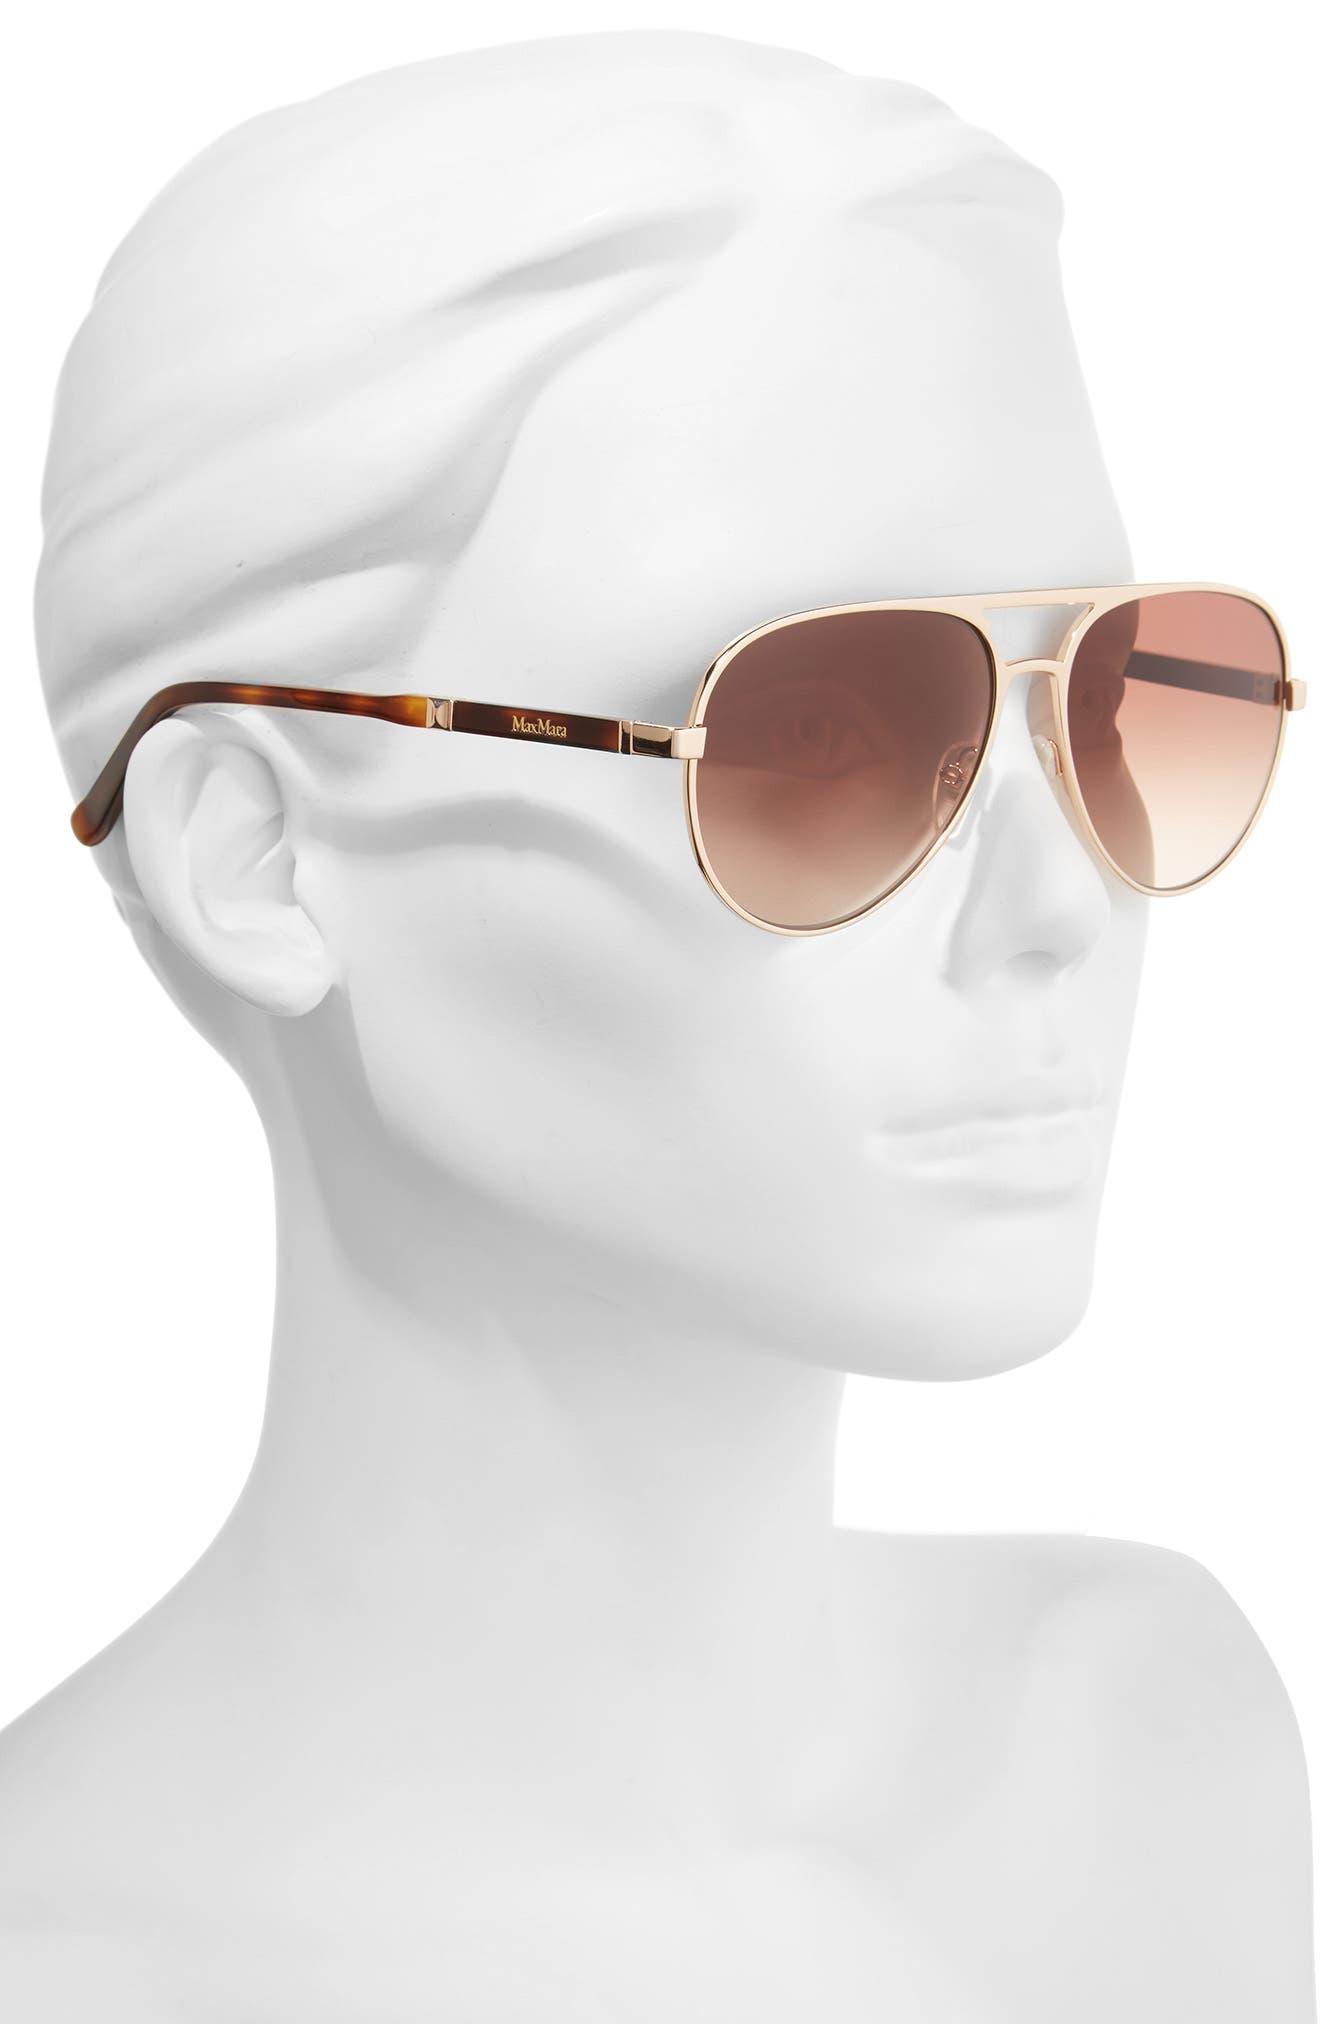 Desigs 57mm Gradient Aviator Sunglasses,                             Alternate thumbnail 2, color,                             710